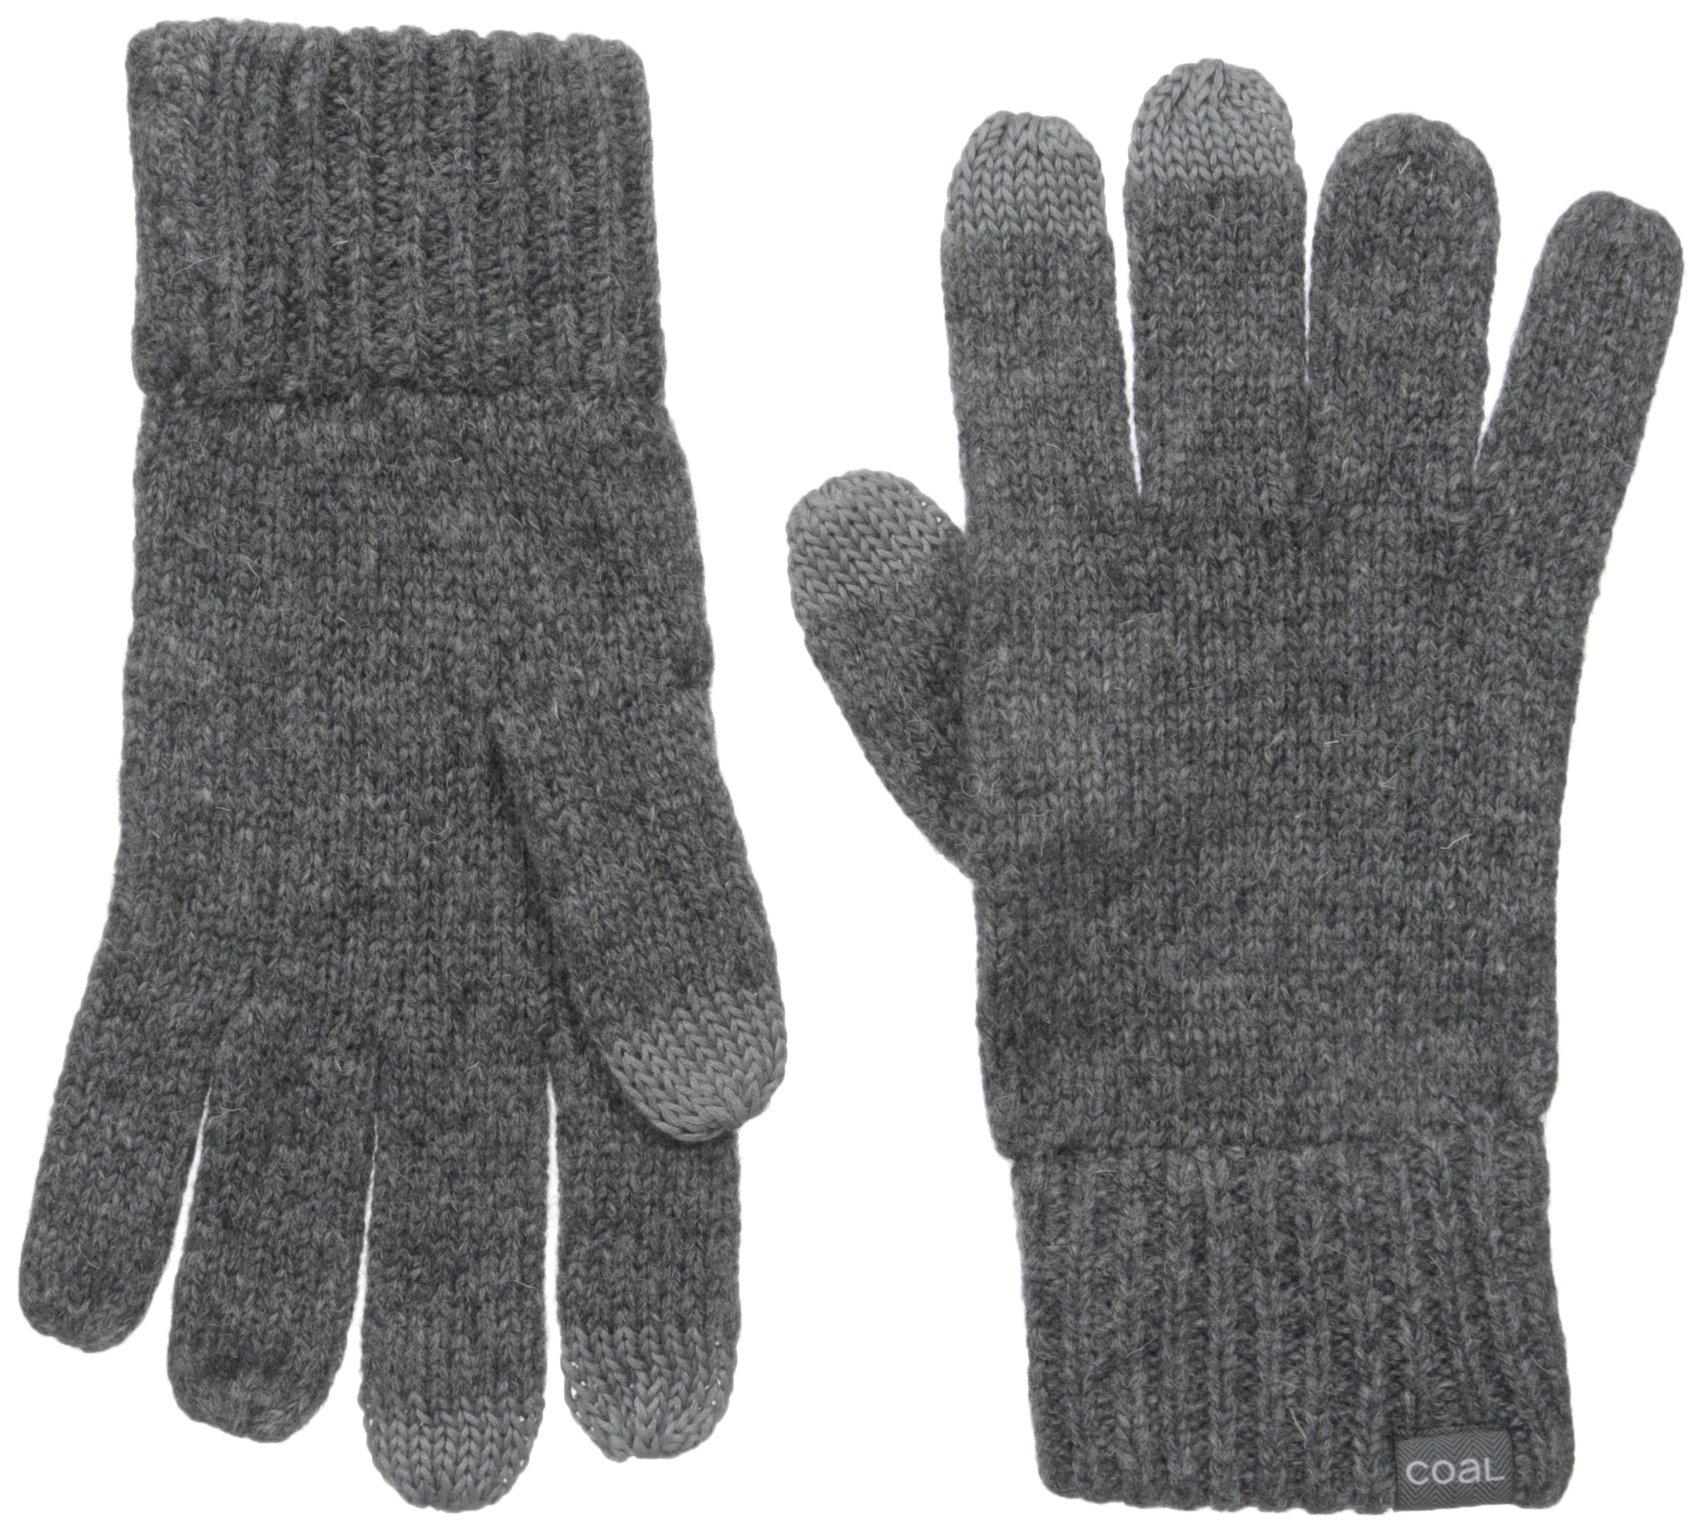 Coal Men's Randle Glove